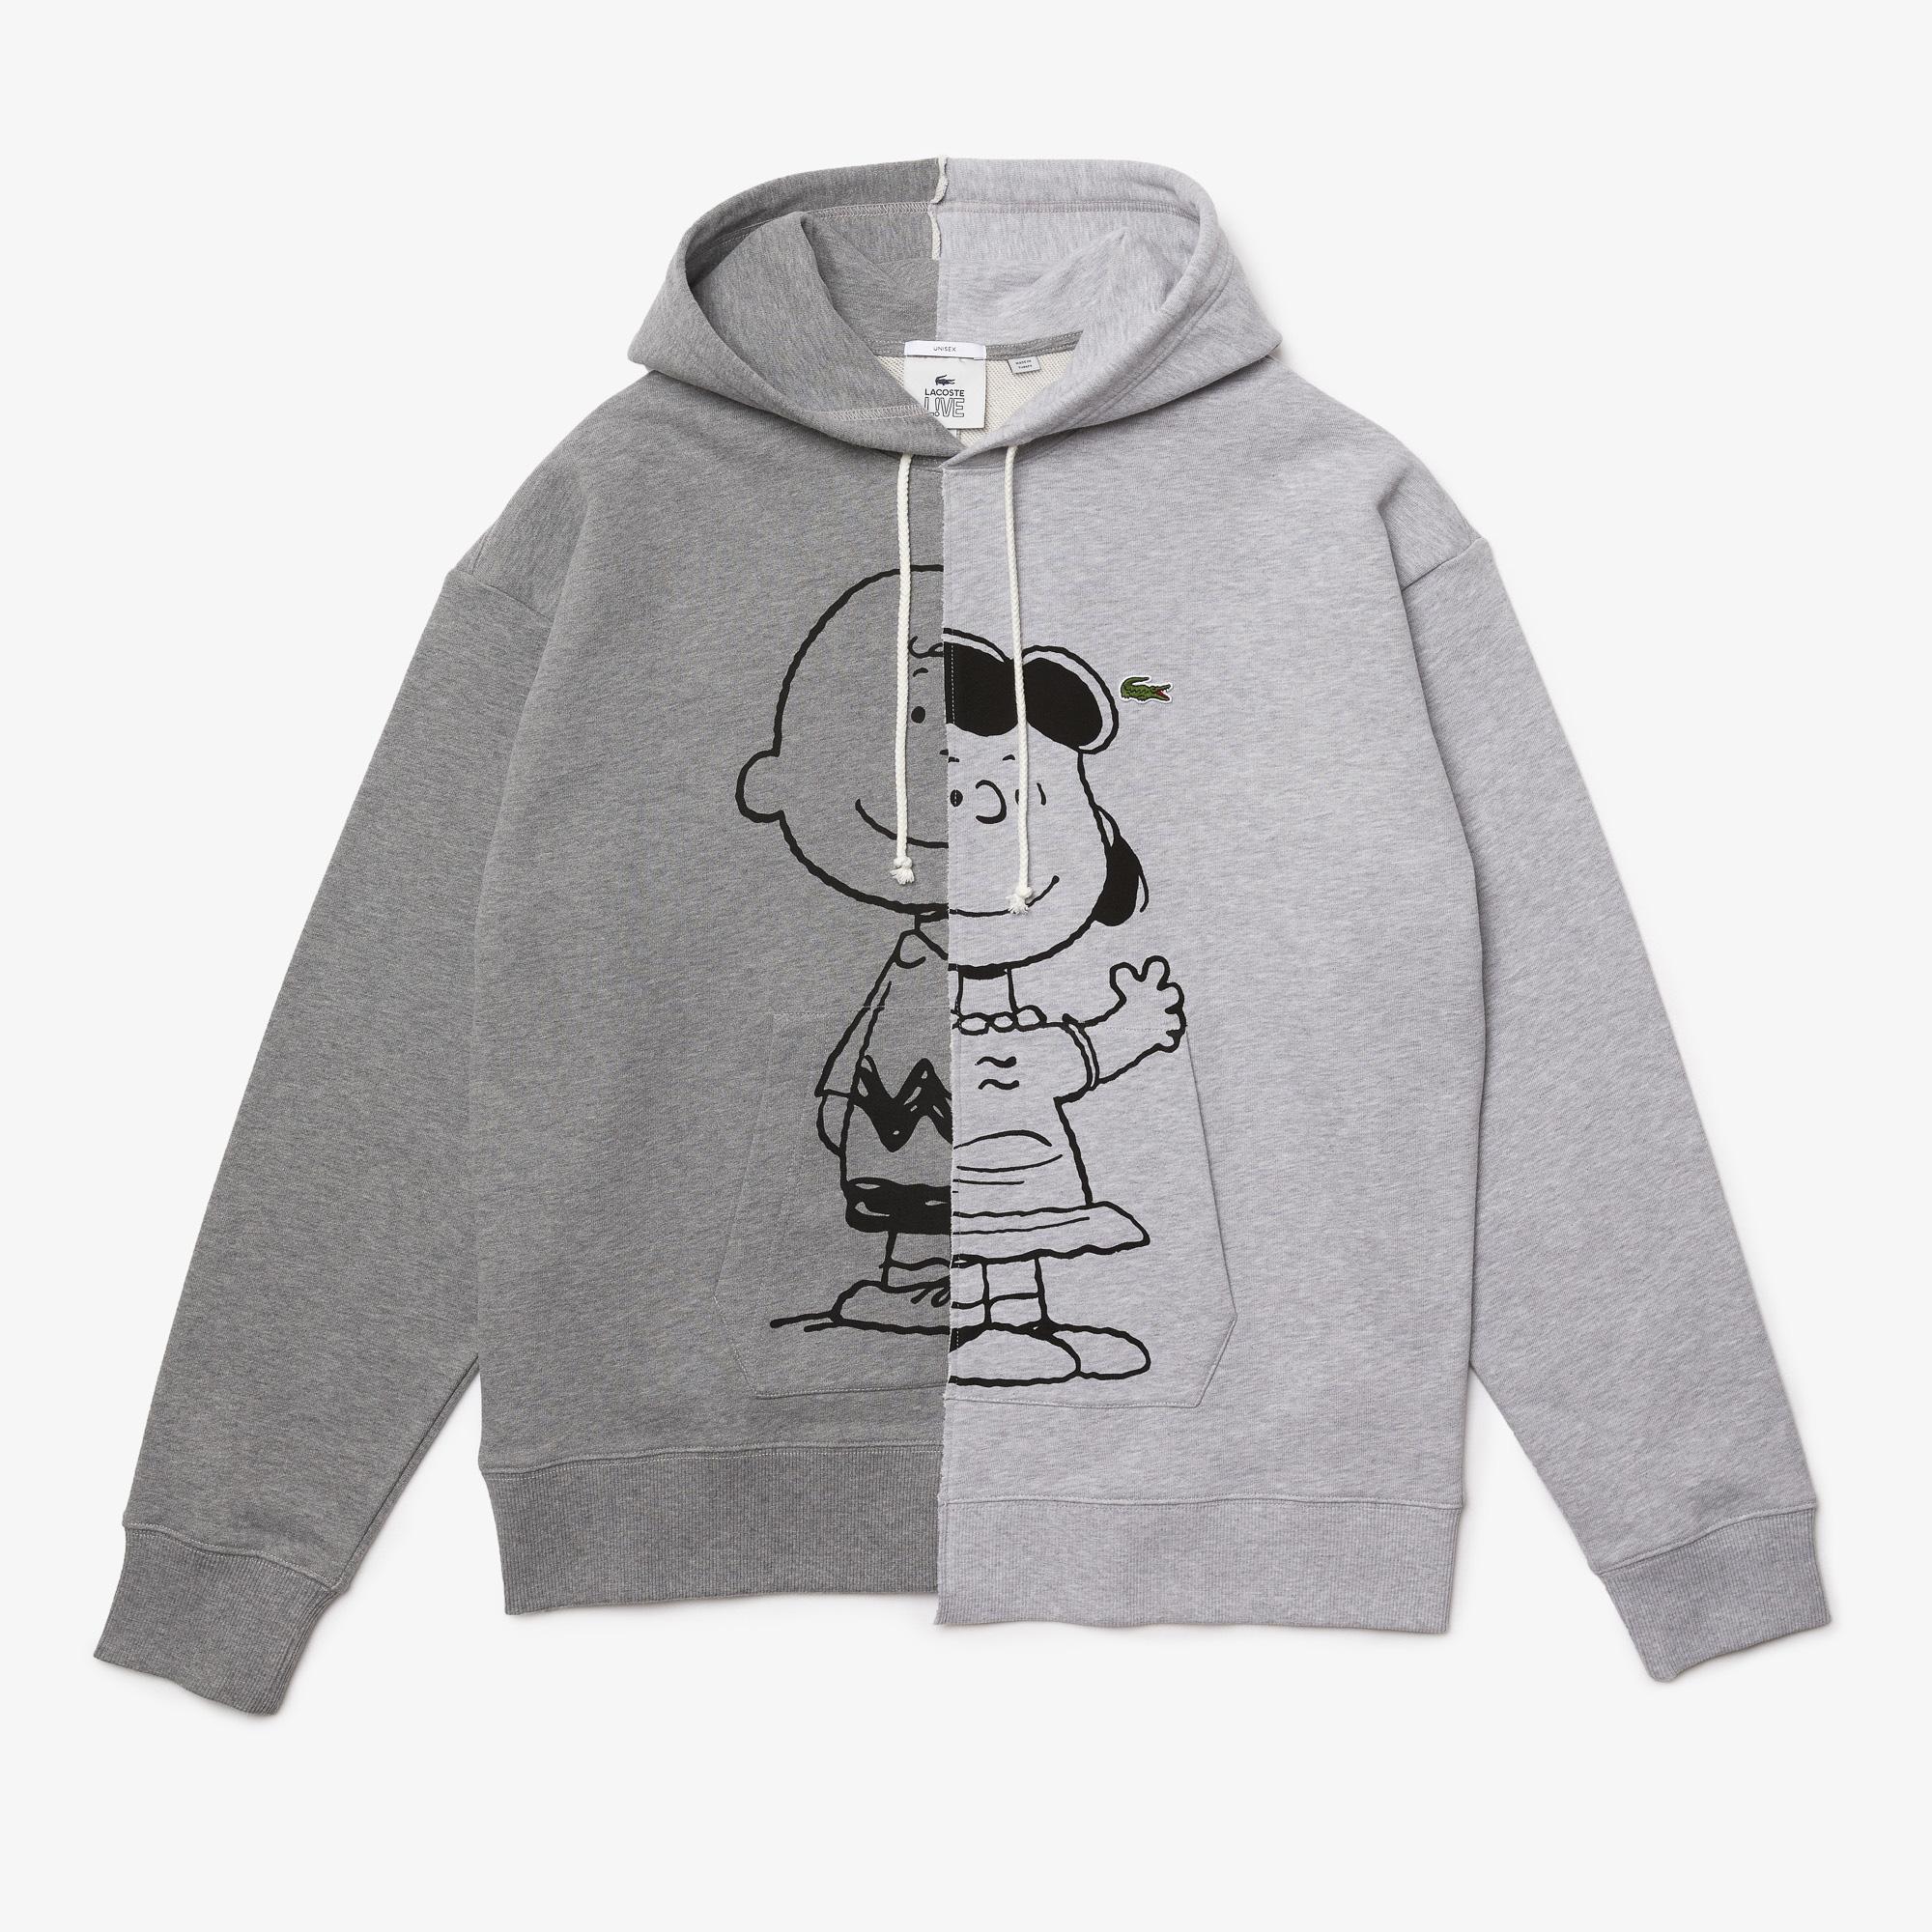 Lacoste L!VE x Peanuts Bluza z kapturem unisex, Loose Fit